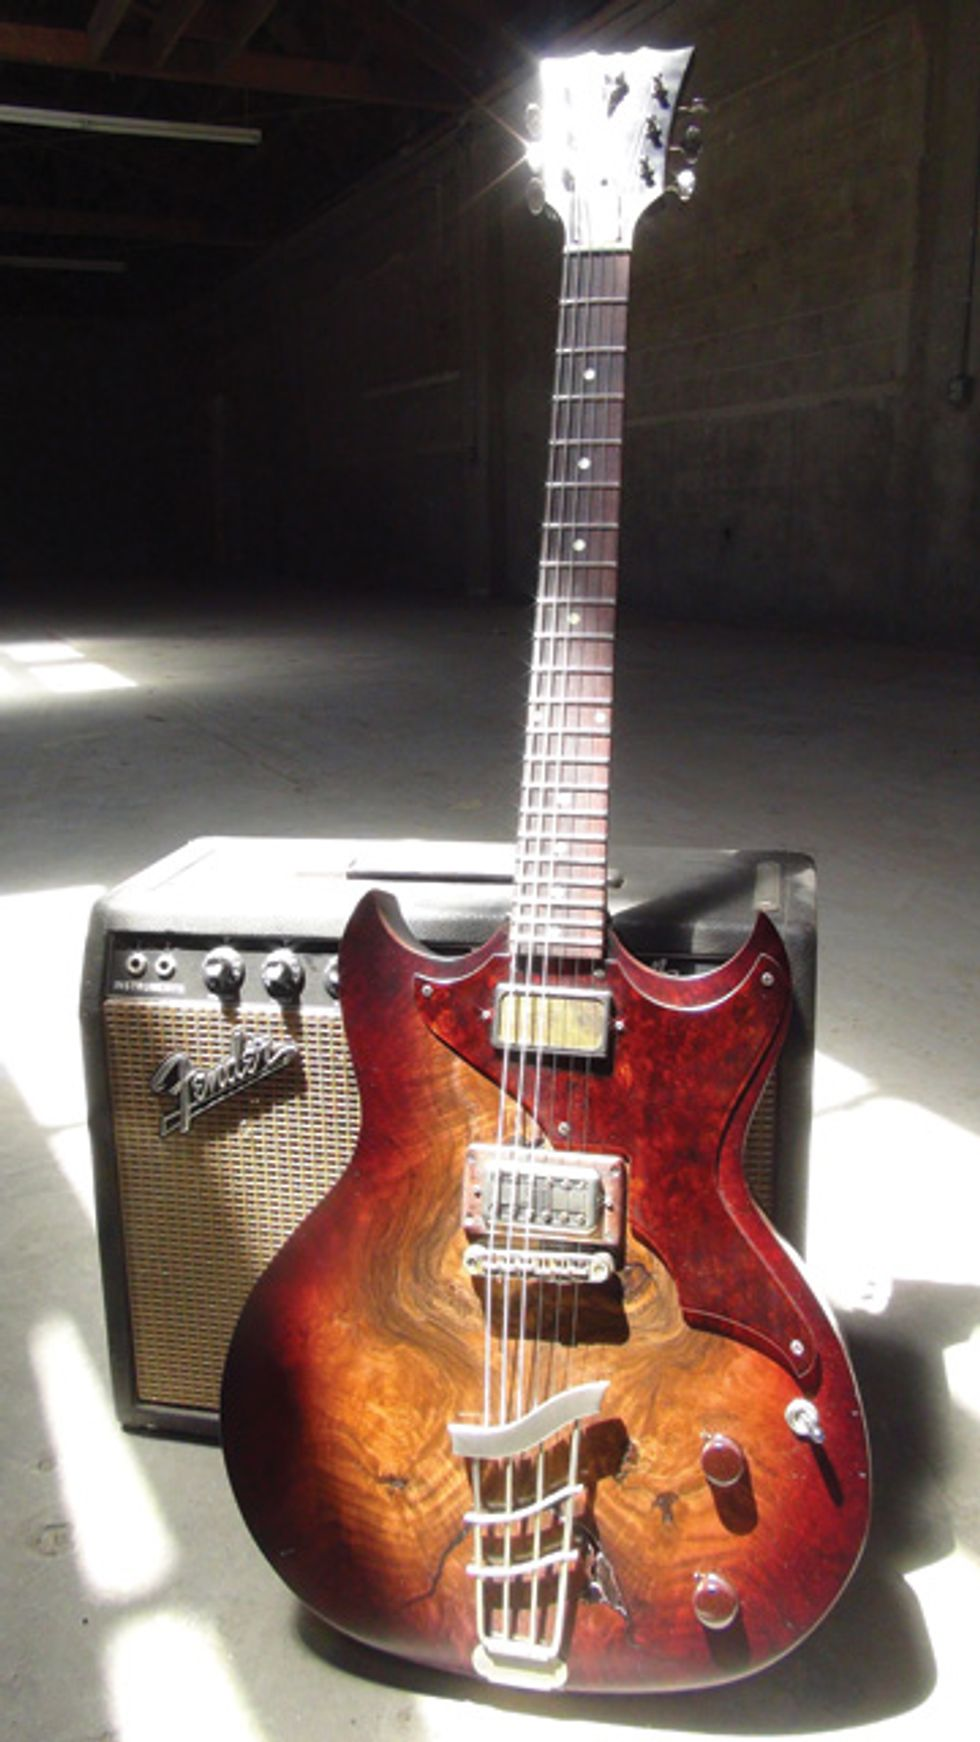 guitar of the month josh homme custom echopark crow premier guitar. Black Bedroom Furniture Sets. Home Design Ideas